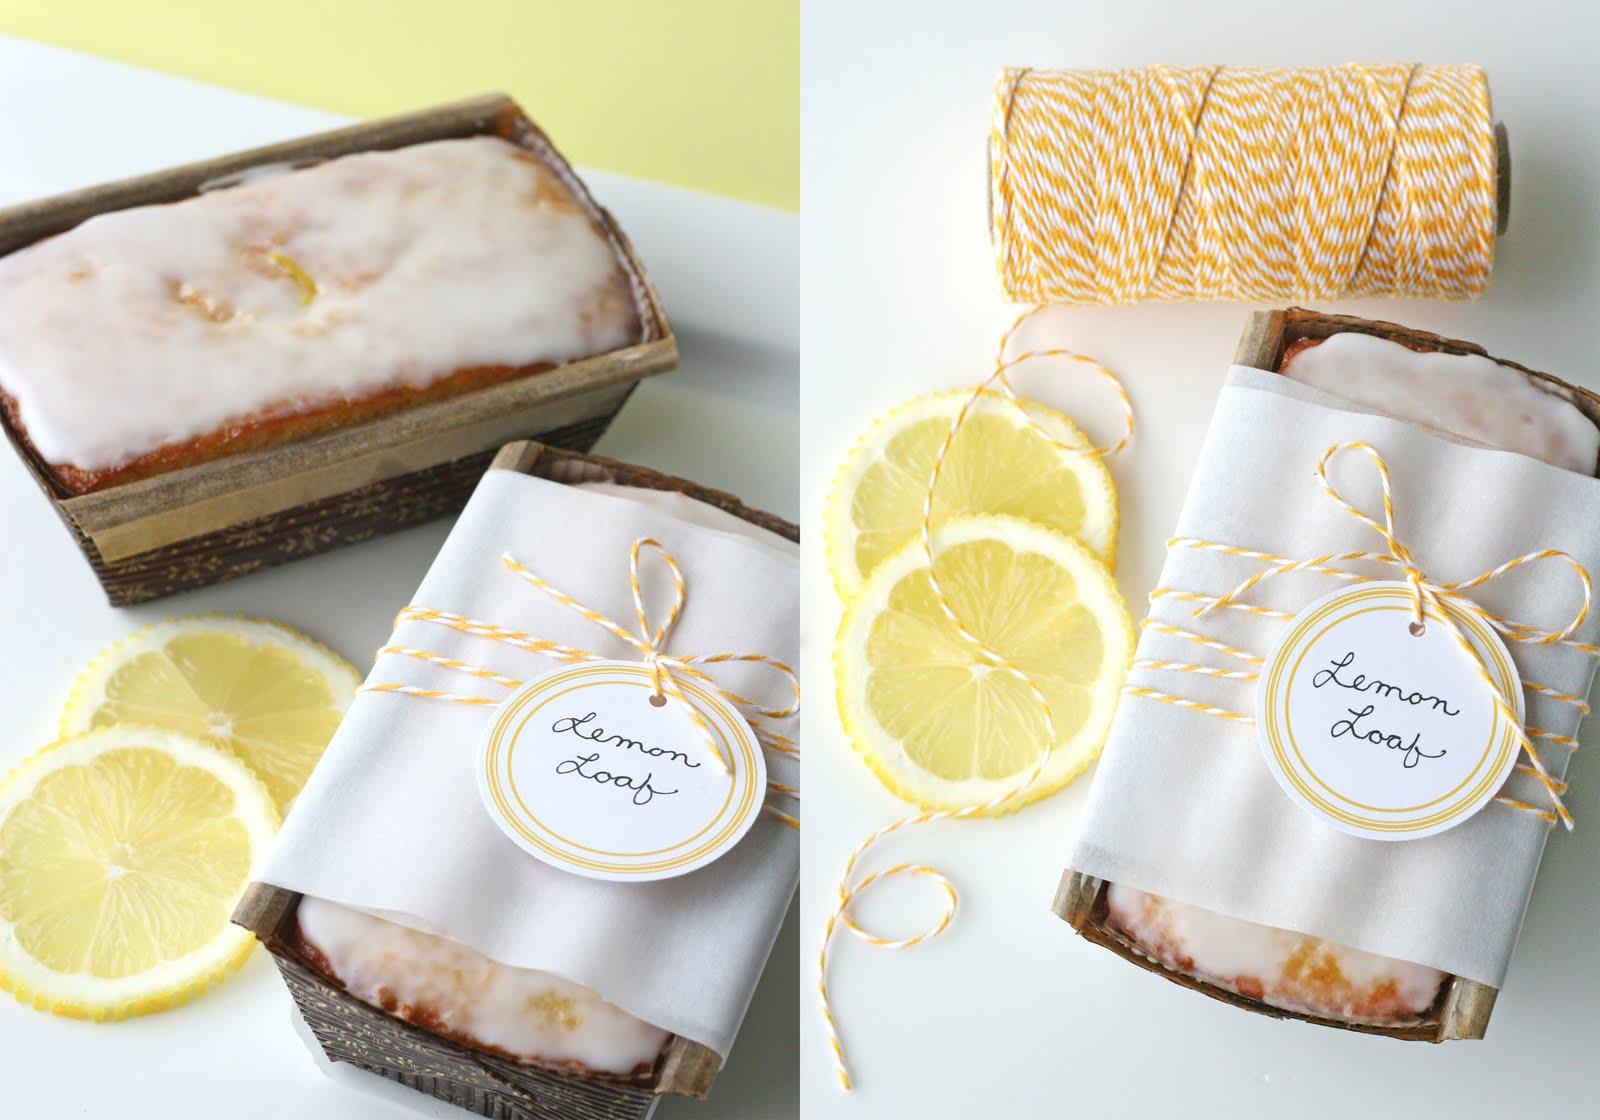 Glorious Treats: Lemony Lemon Bread